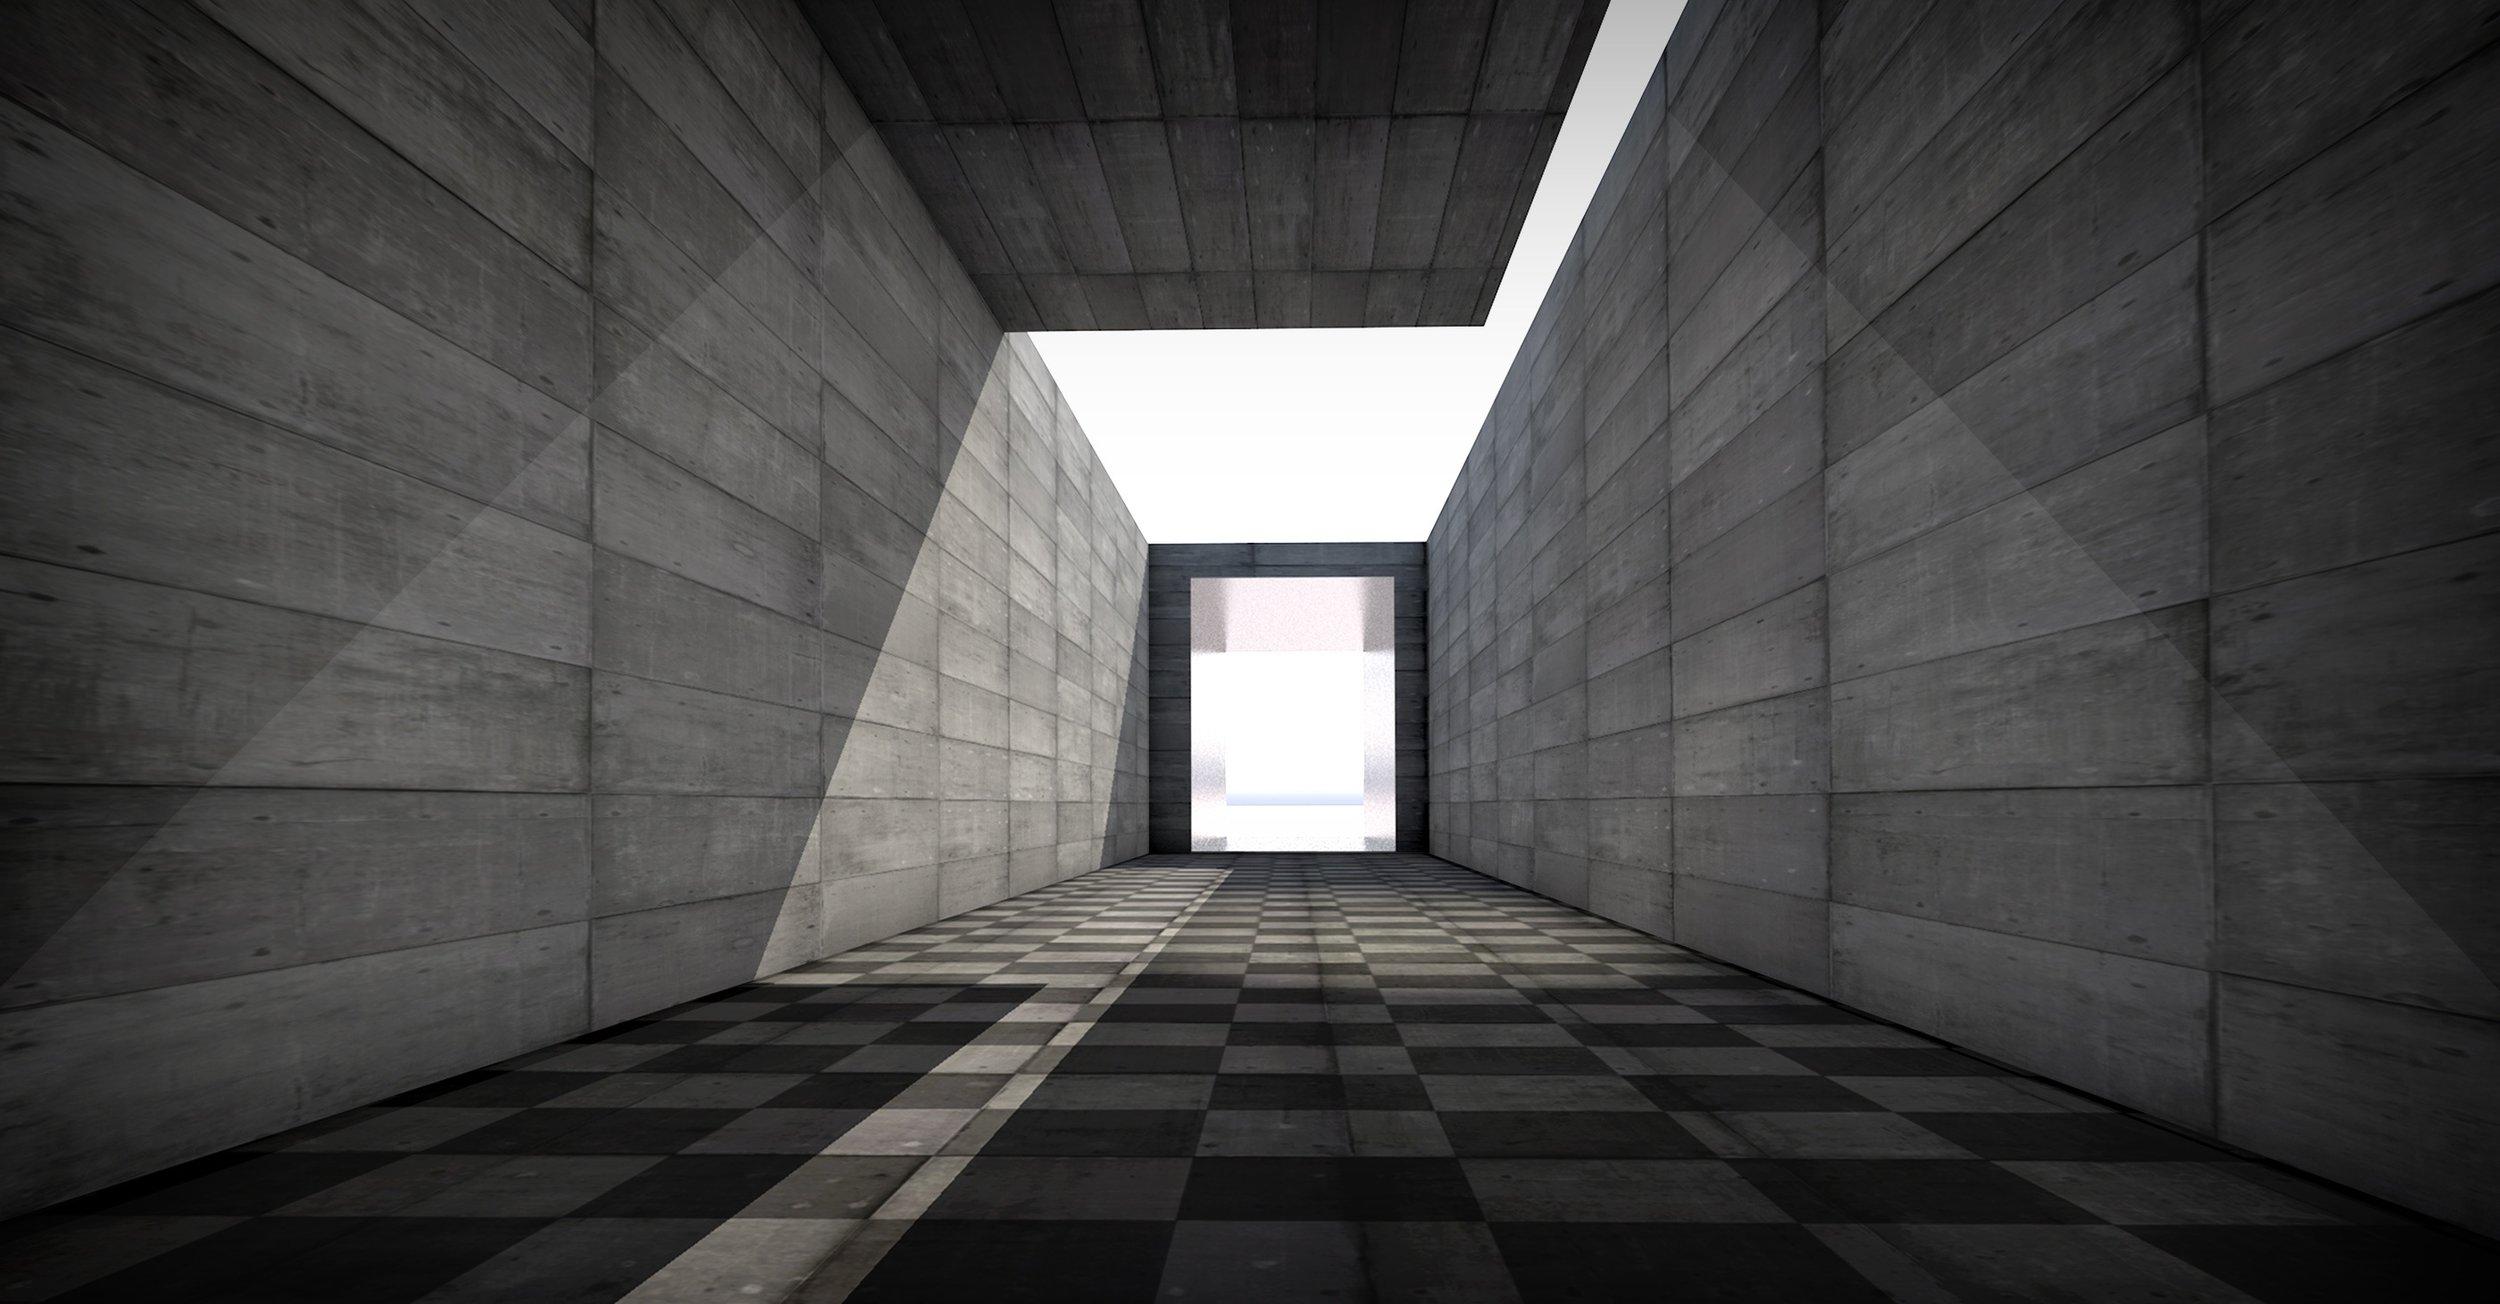 tunnel-2033983.jpg